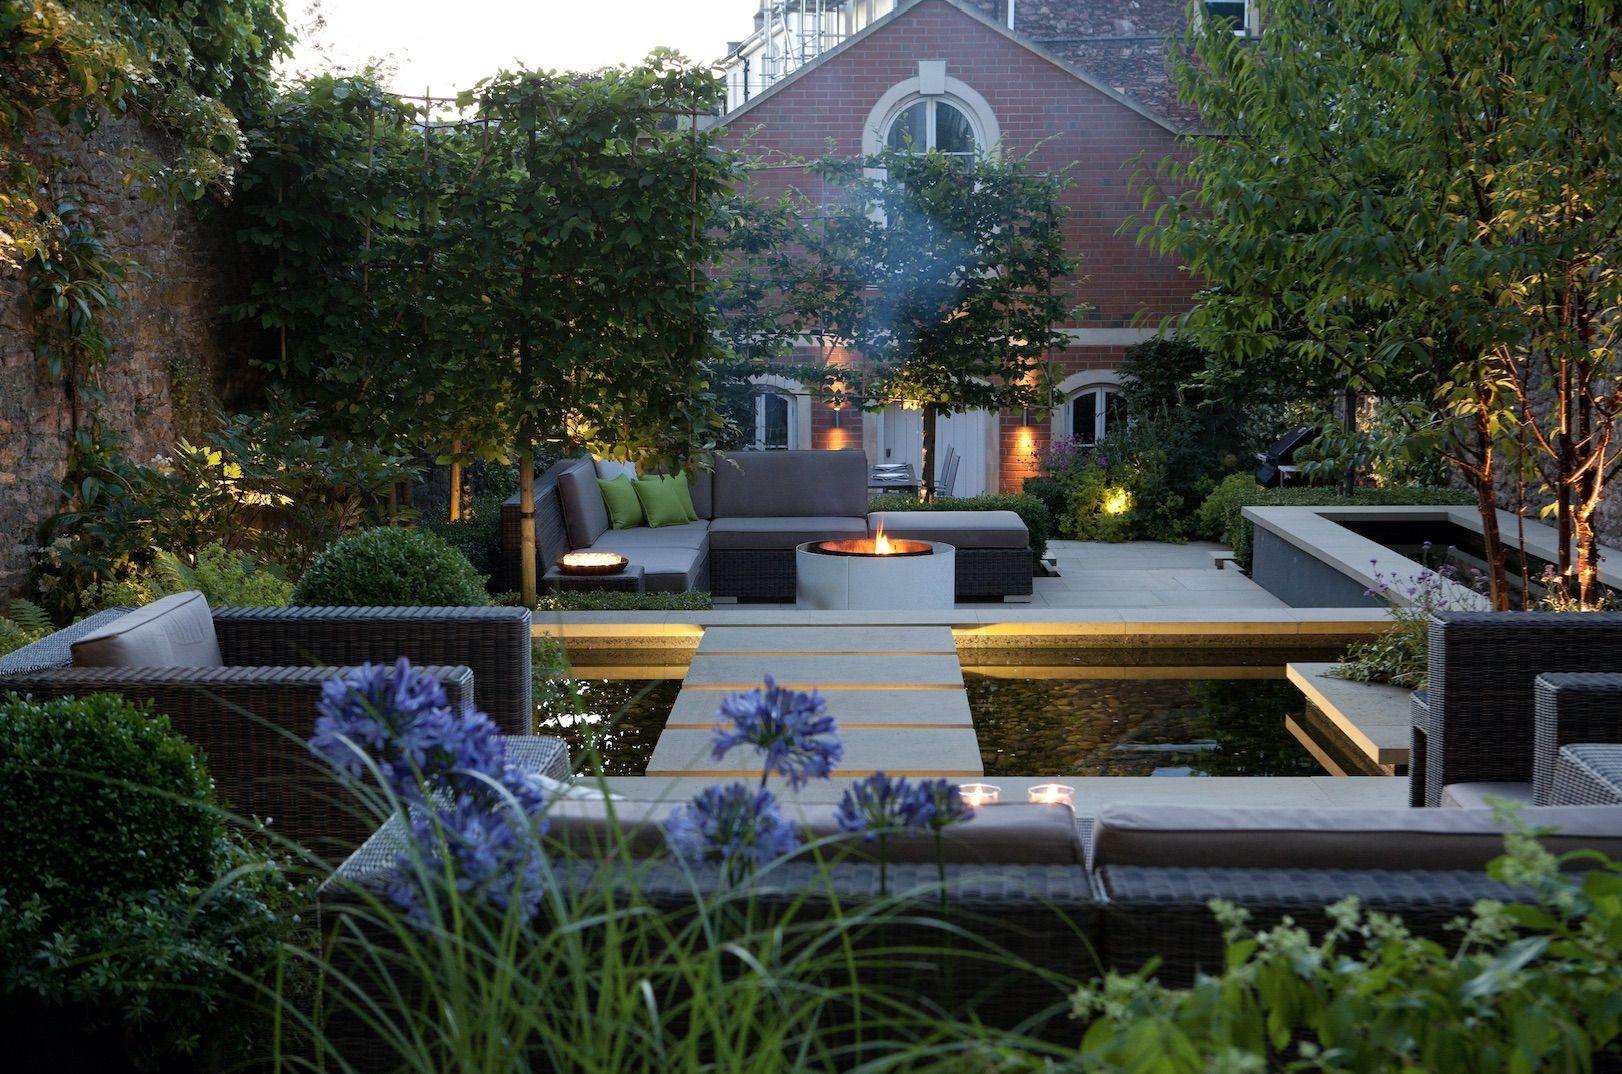 Winner Of The Sgd People S Choice Award 2016 Karena Batstone Msgd Townhouse Garden Garden Architecture Urban Garden